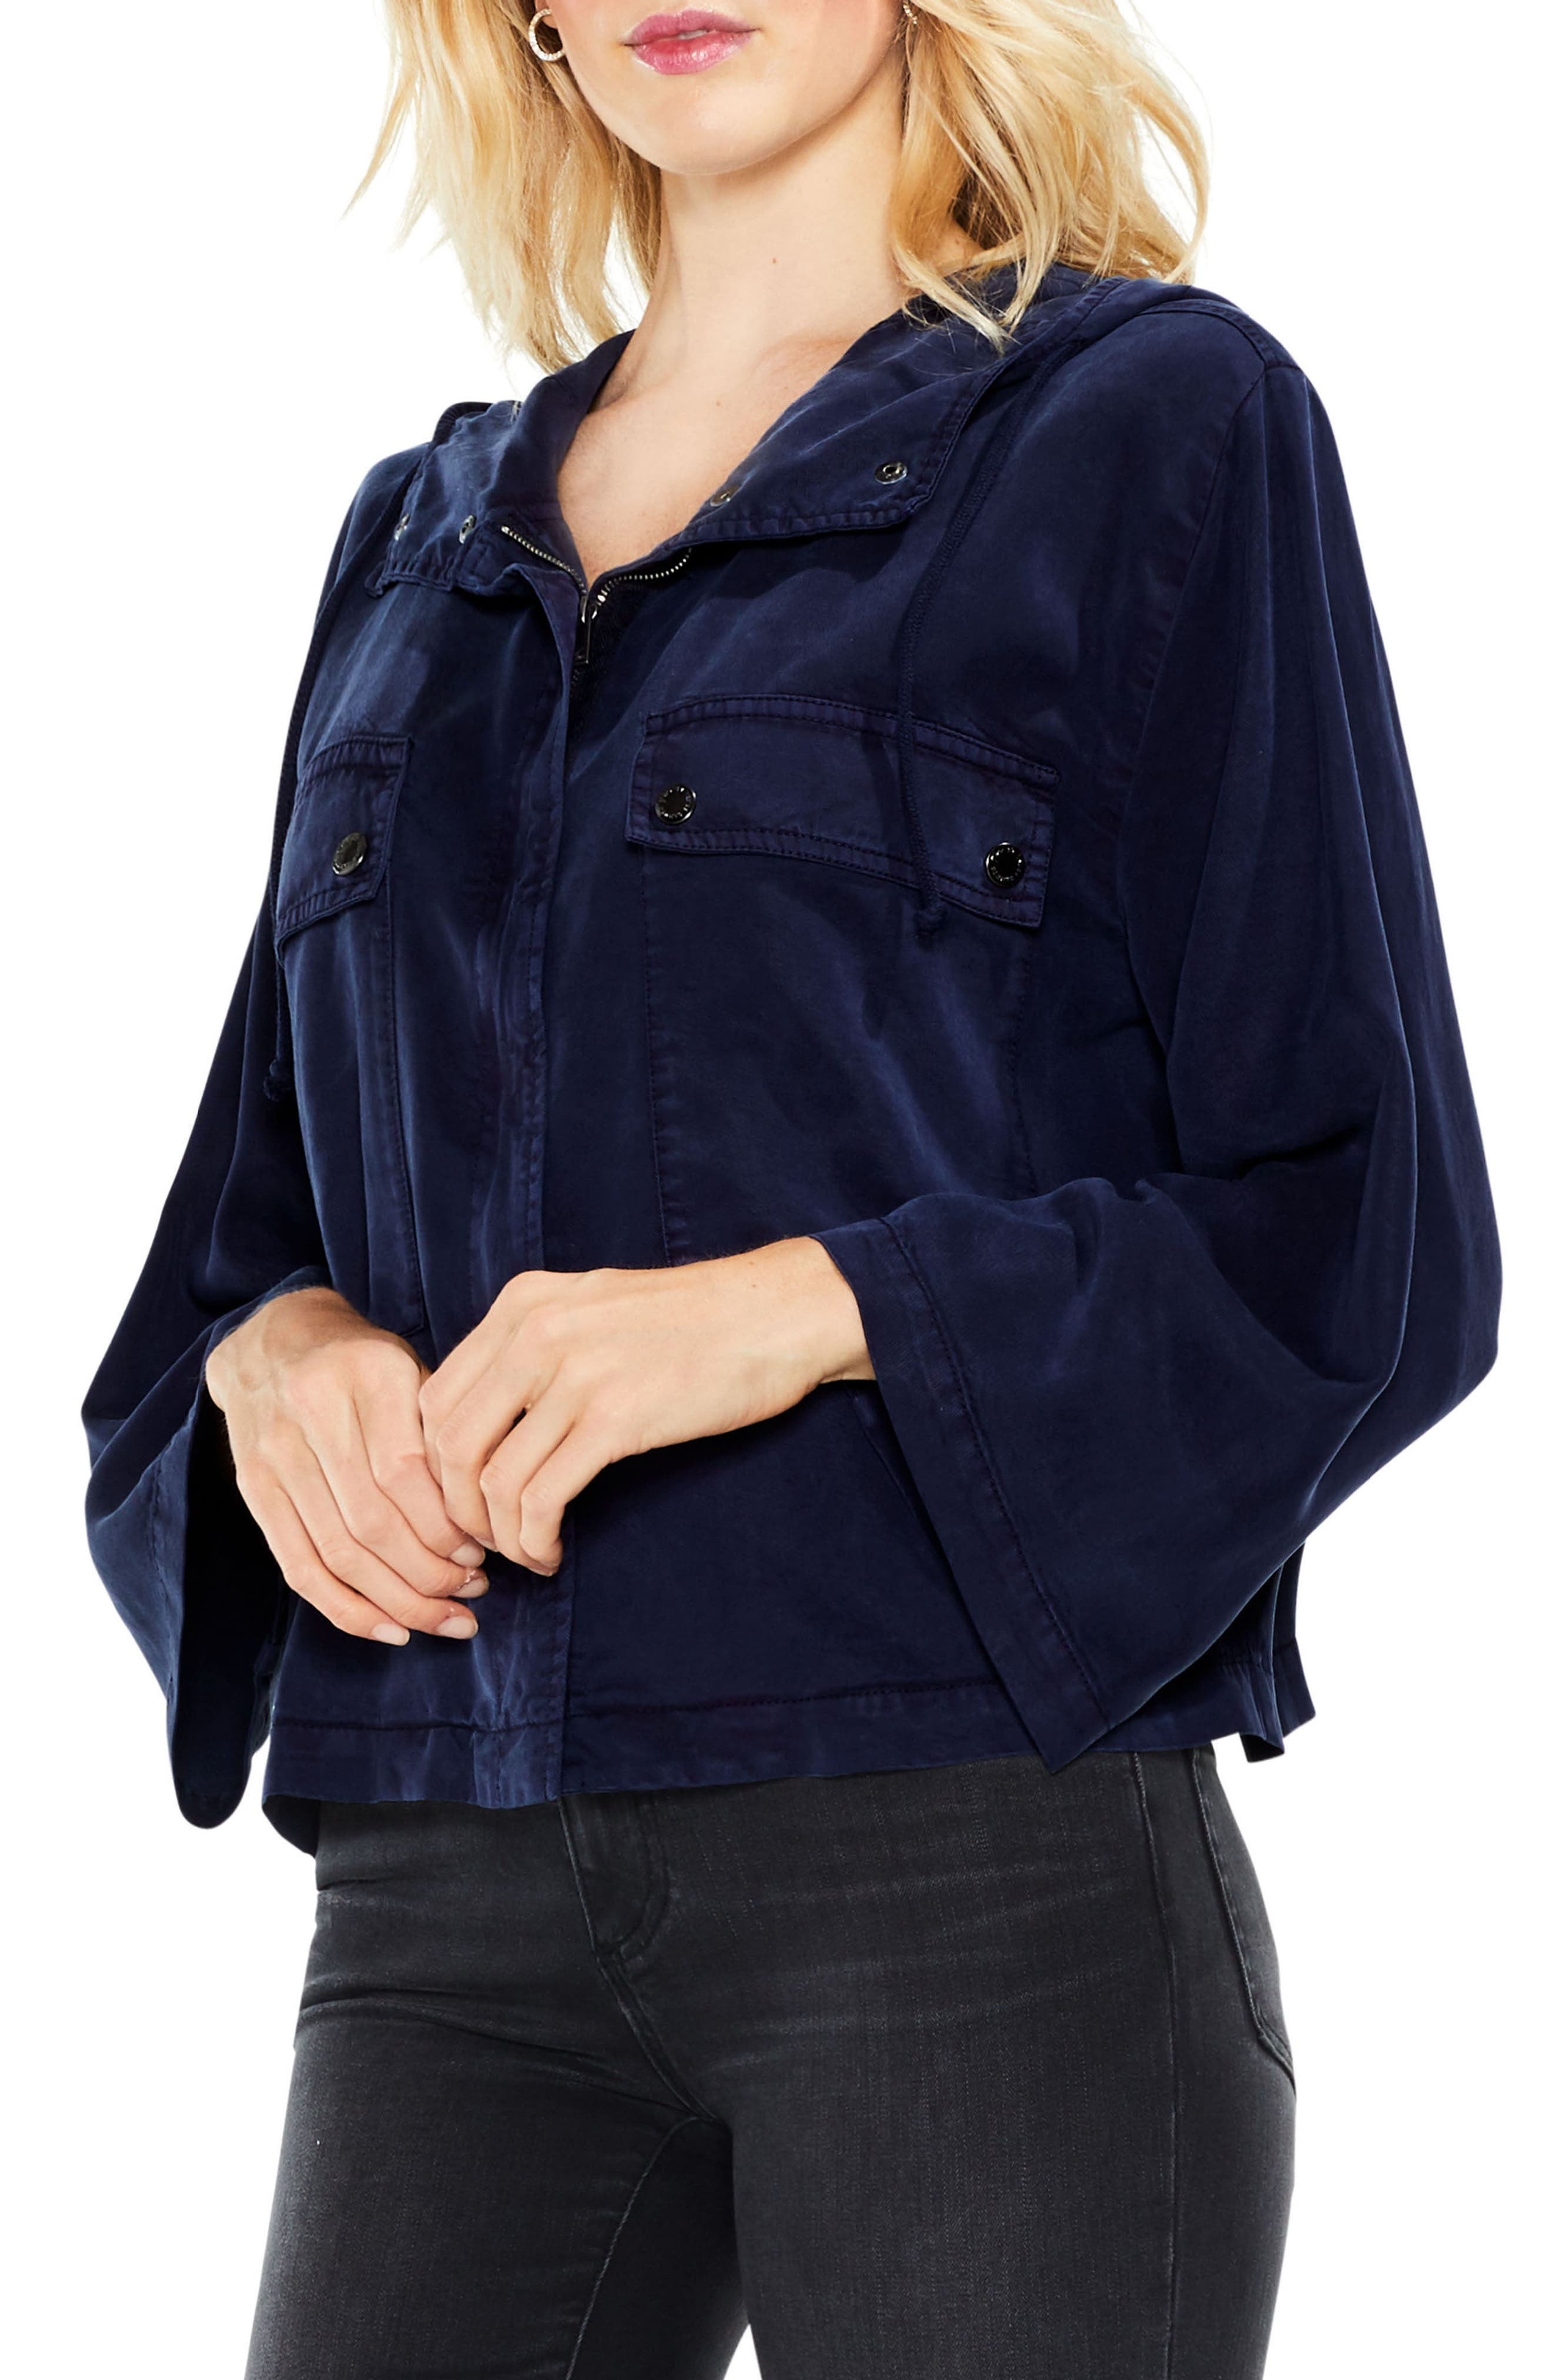 Bell Sleeve Hooded Jacket,                             Alternate thumbnail 2, color,